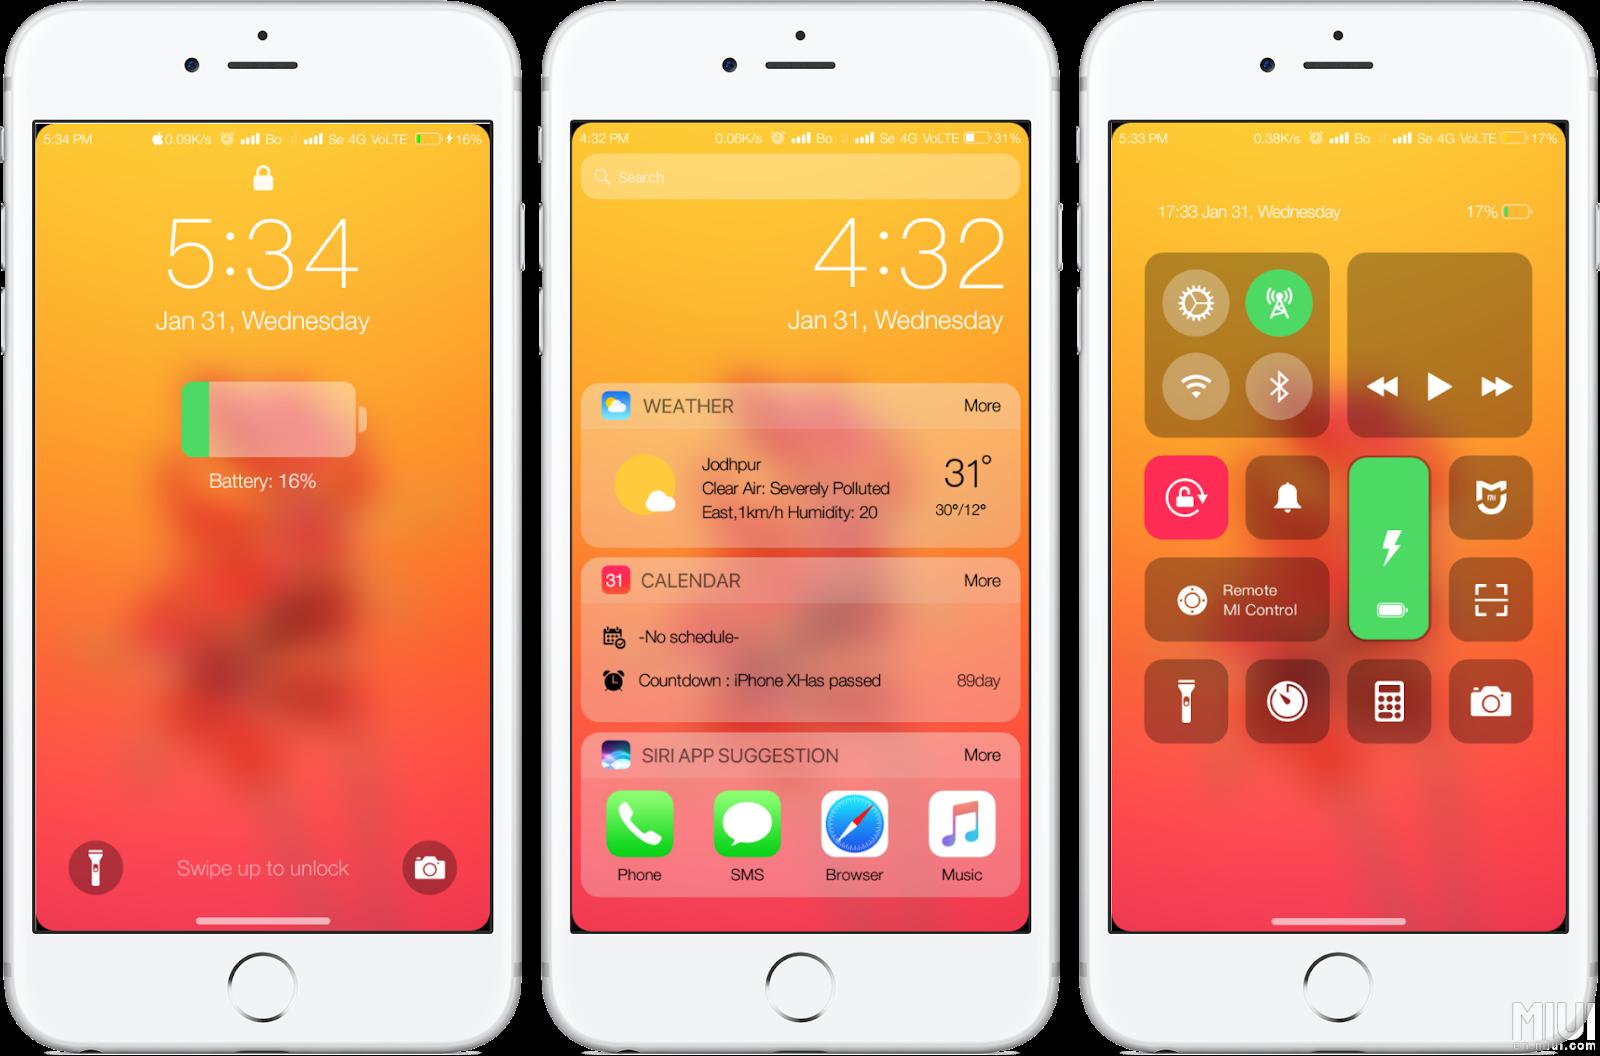 V9 Theme][MiBoSe] BoSe iOS 11 6X Pro - Papuntu (MIUI Theme)